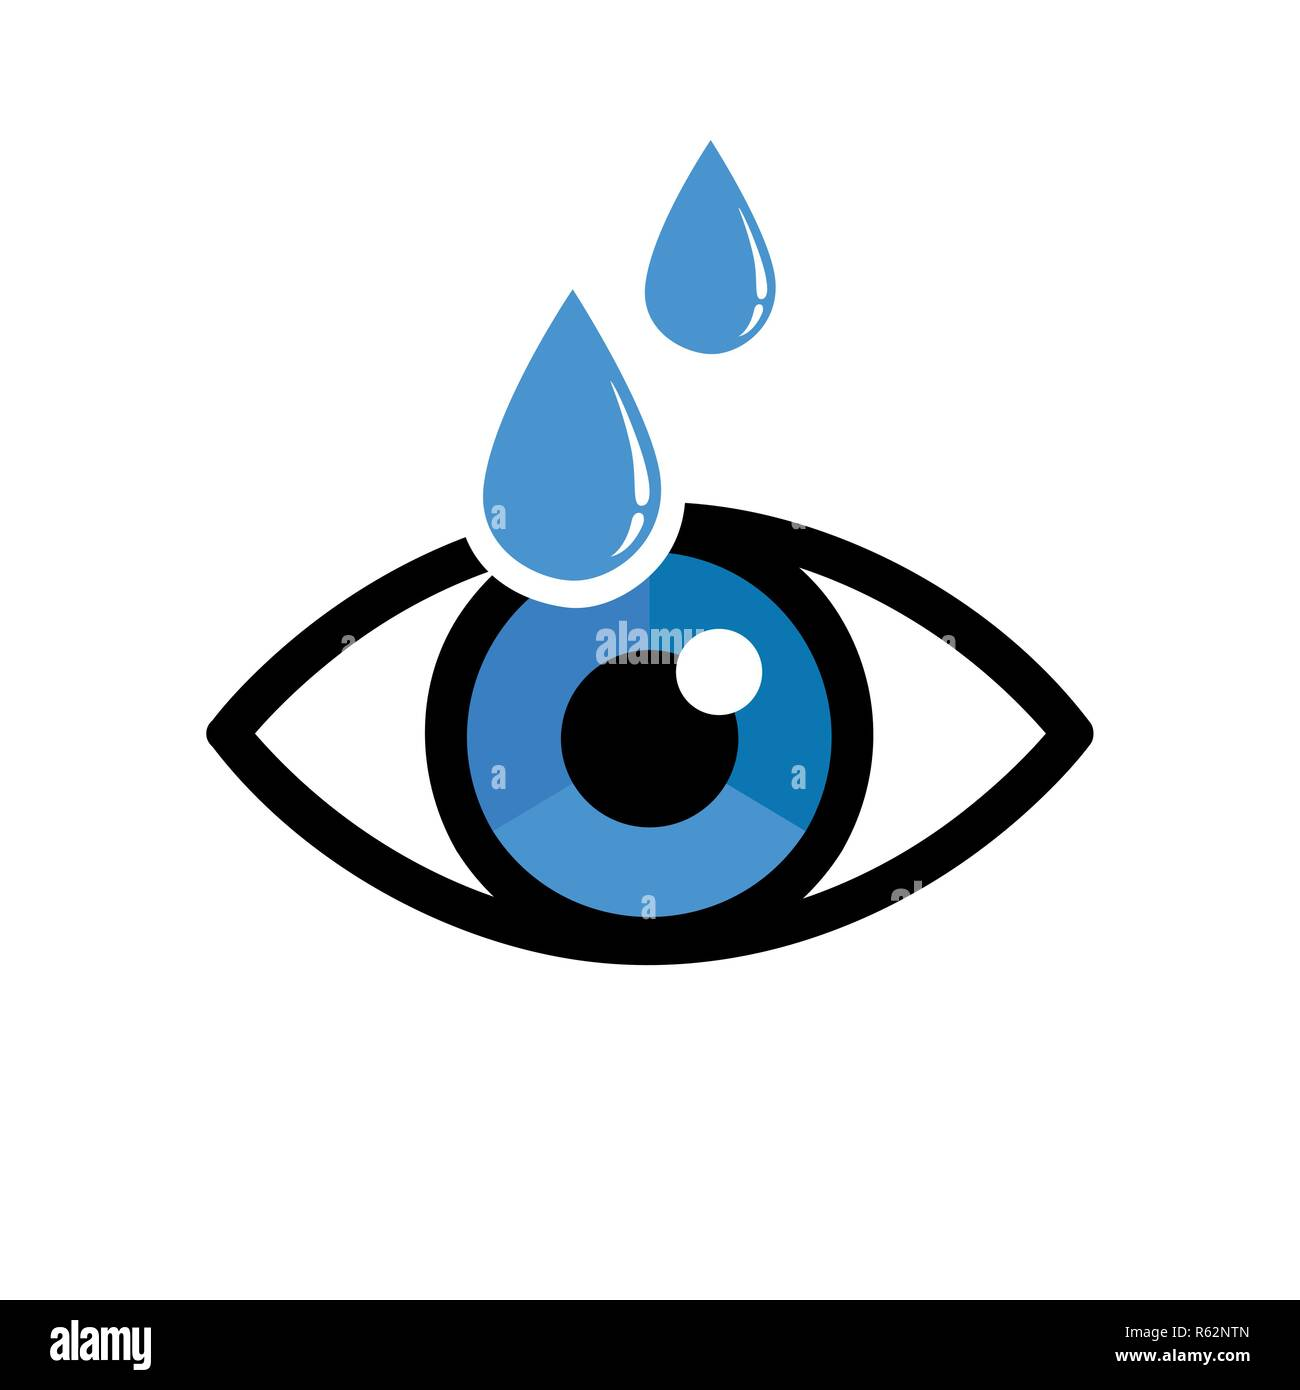 eye with eye drops ophthalmology icon isolated on white background vector illustration EPS10 - Stock Image